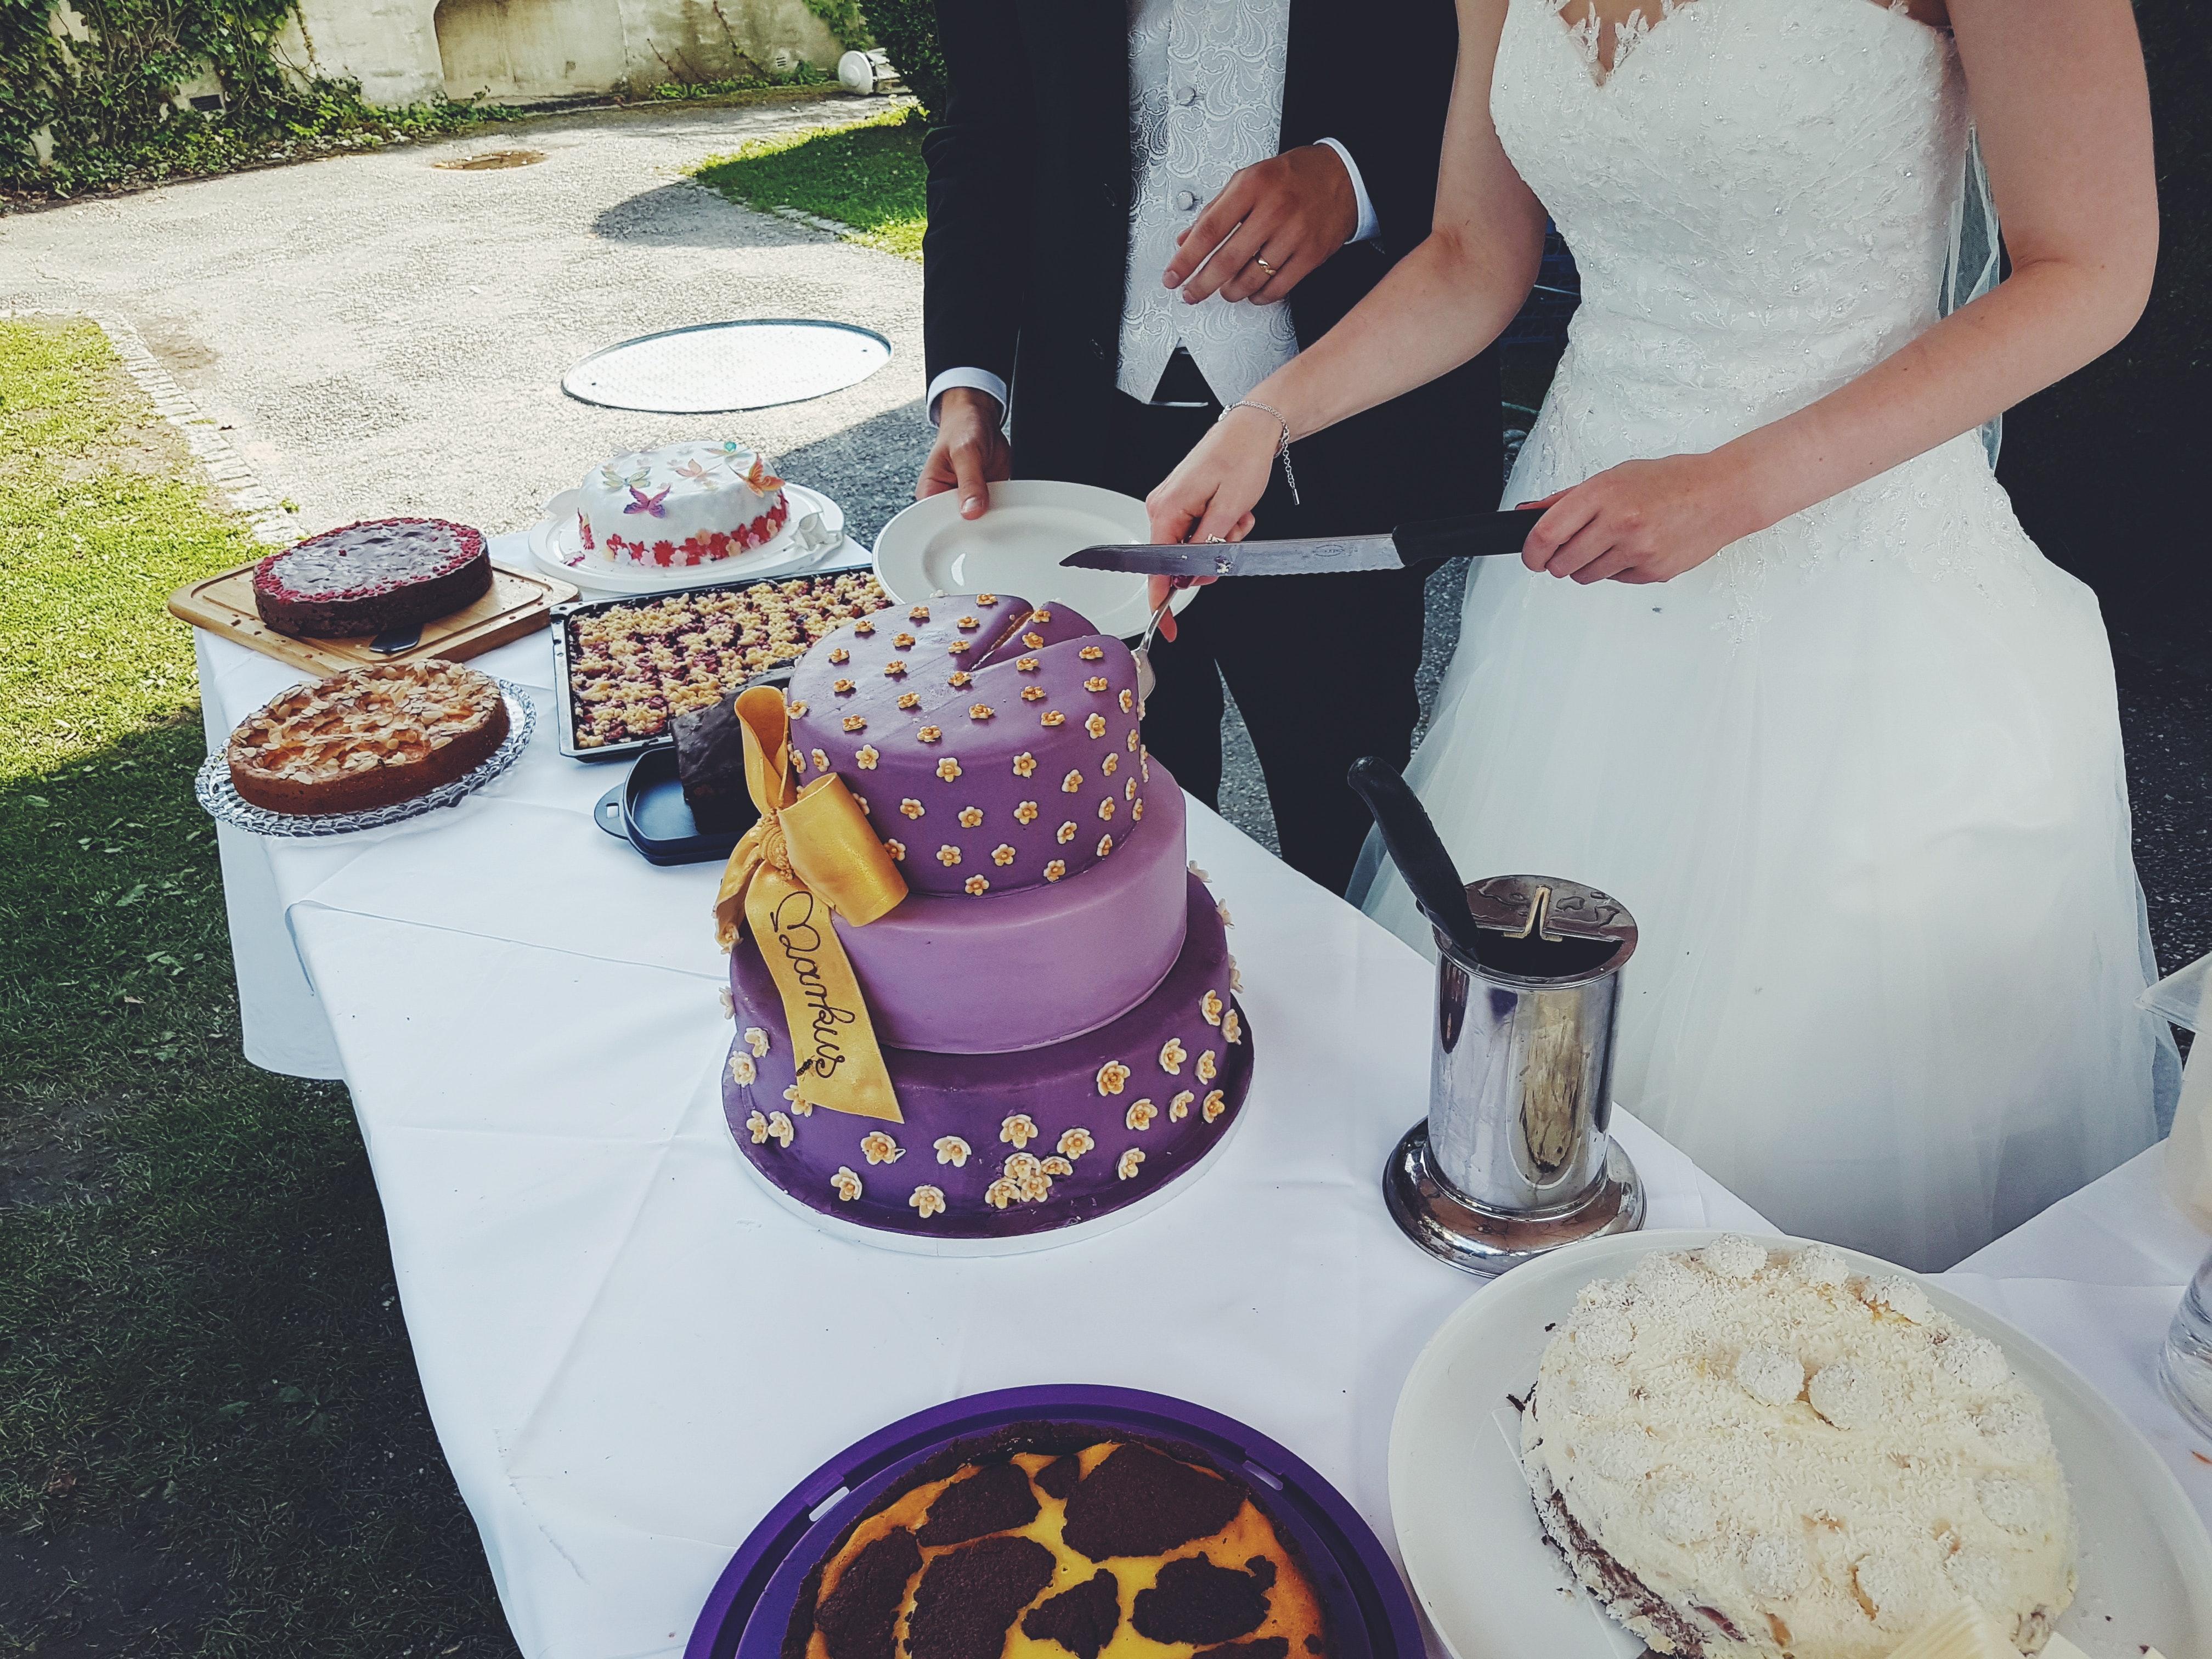 adult-baking-bride-543226